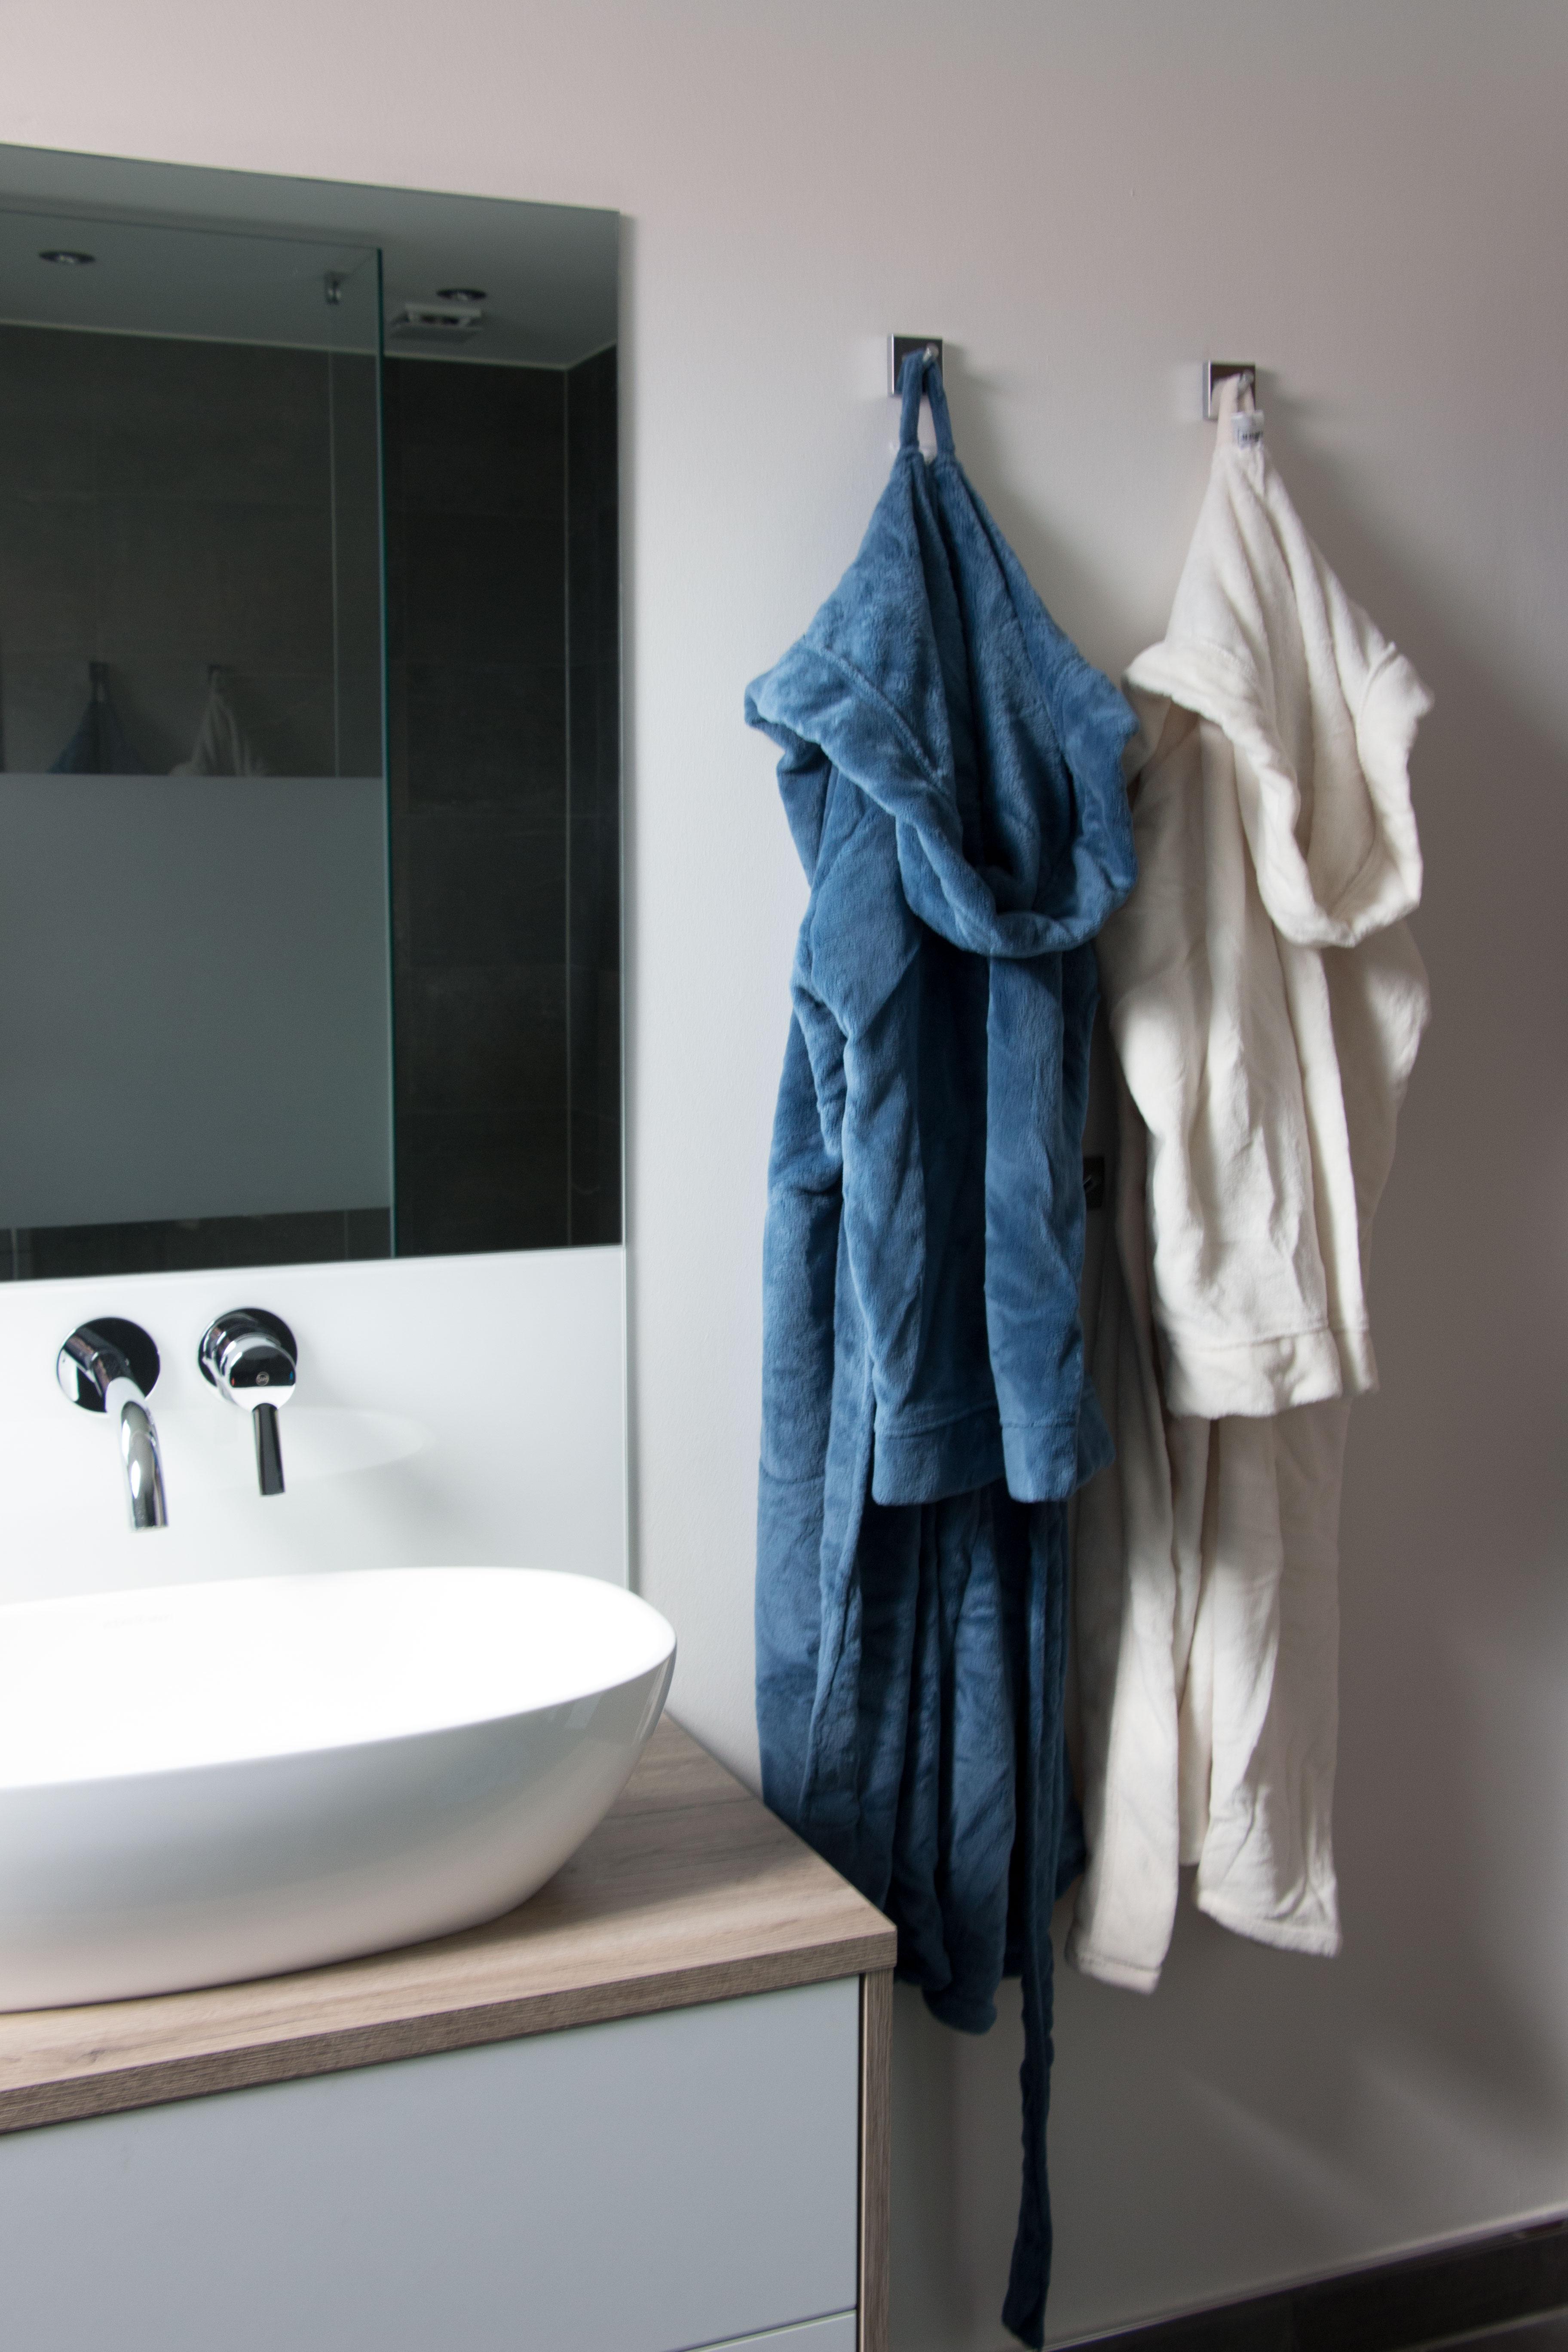 Bademantel, versch. Farben, 100% Polyester